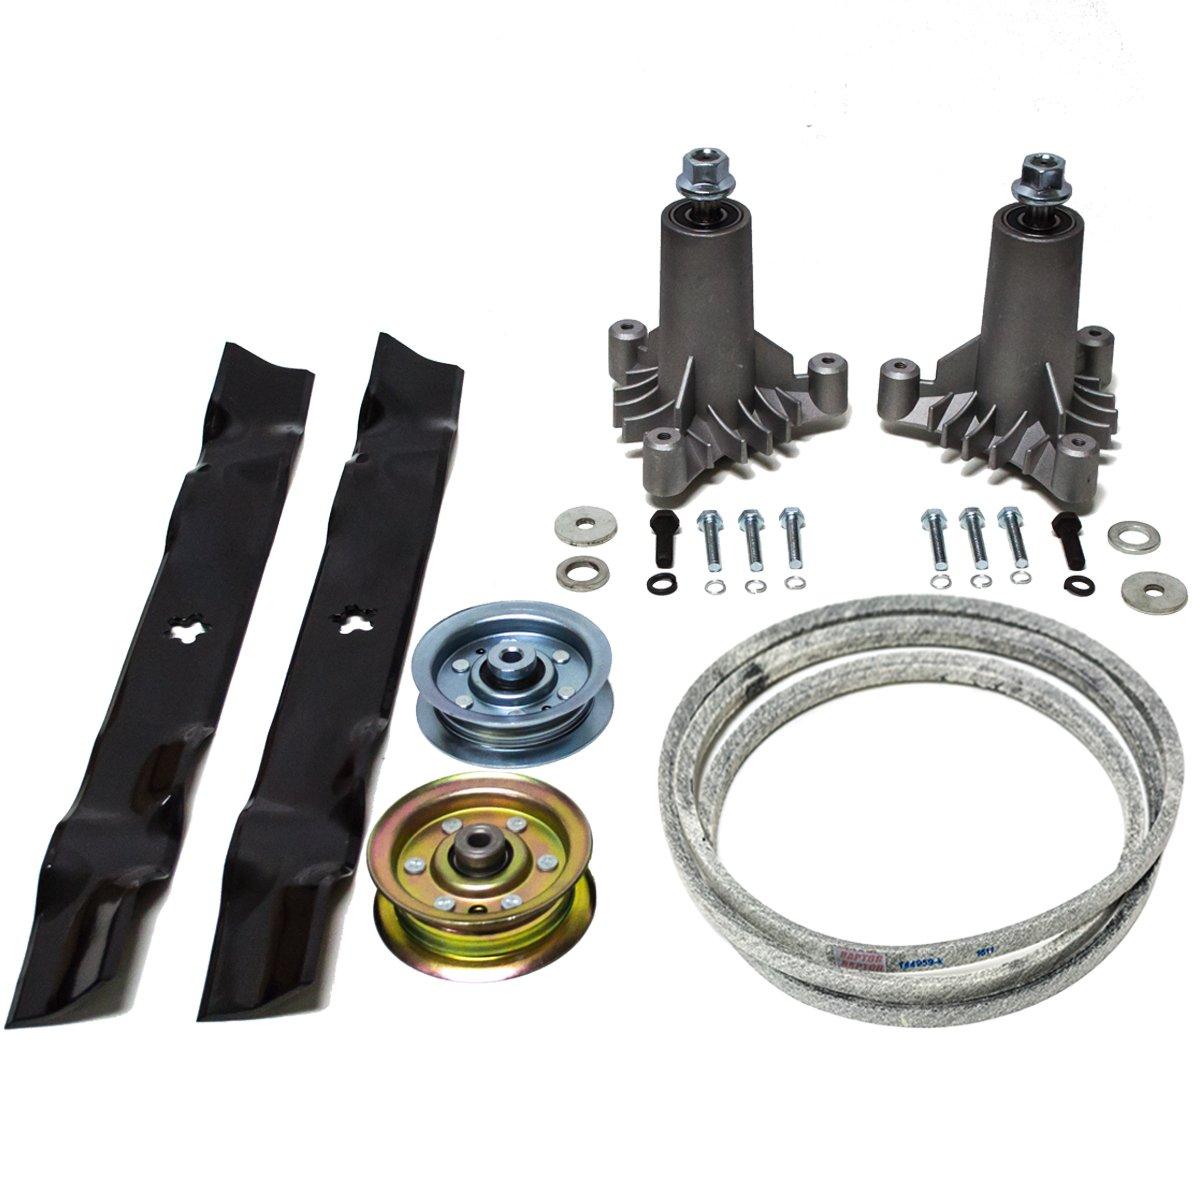 "Sears Craftsman LT2000 42/"" Lawn Mower Deck Parts Rebuild Kit 144959 134149"